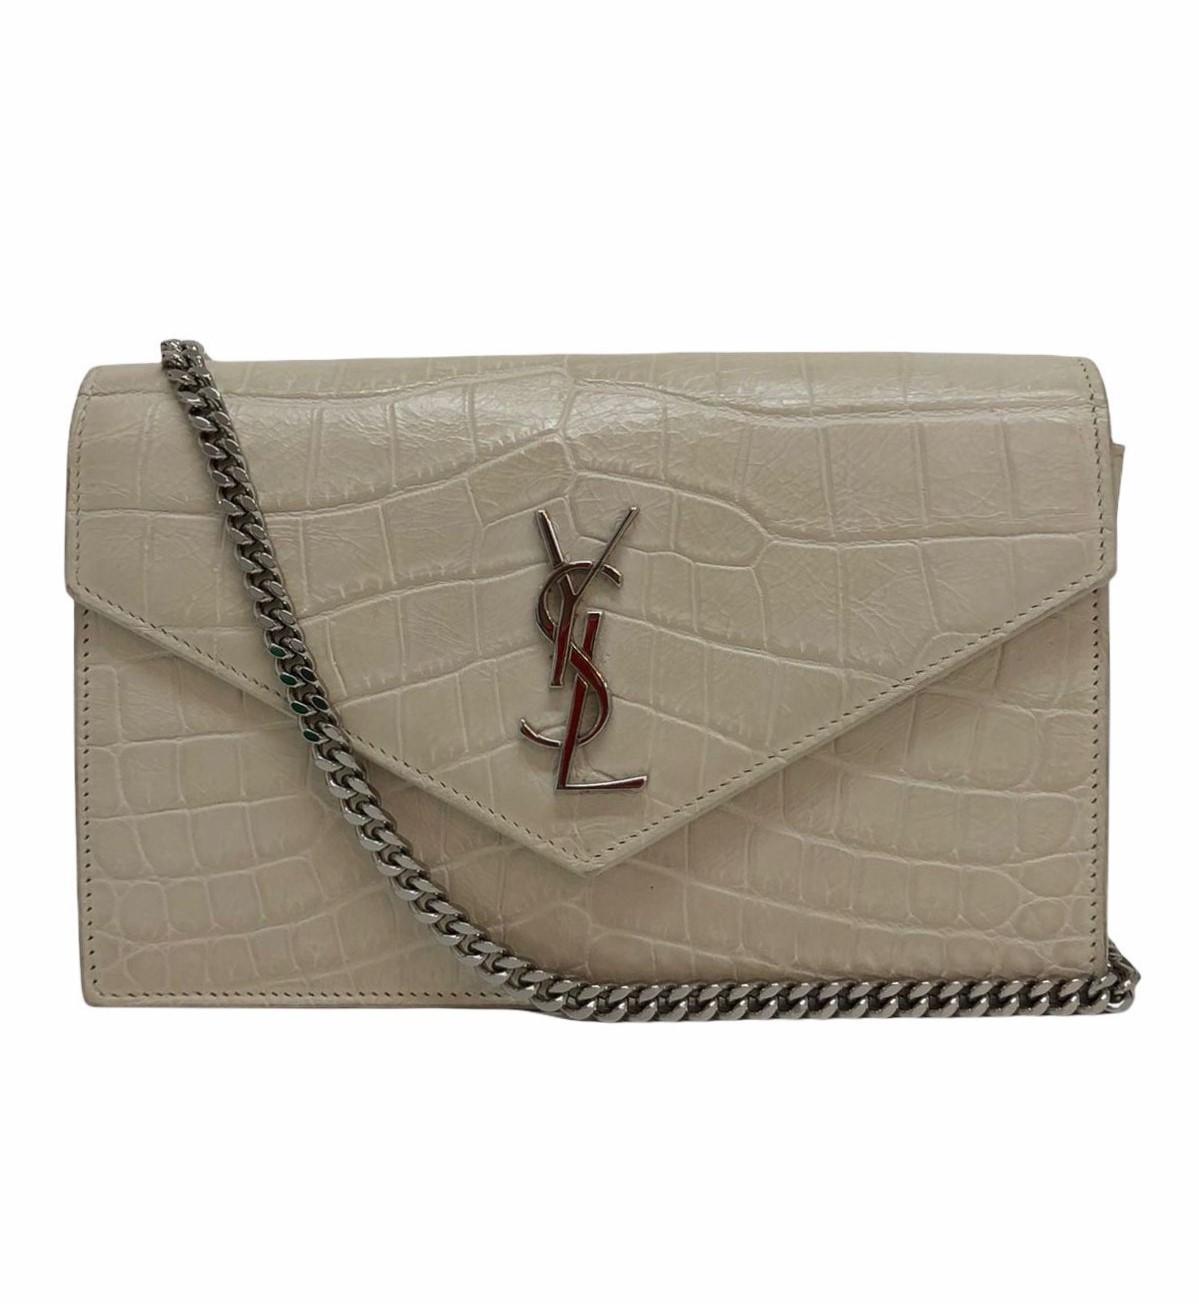 Bolsa Yves Saint Laurent Chain Wallet Crocodile